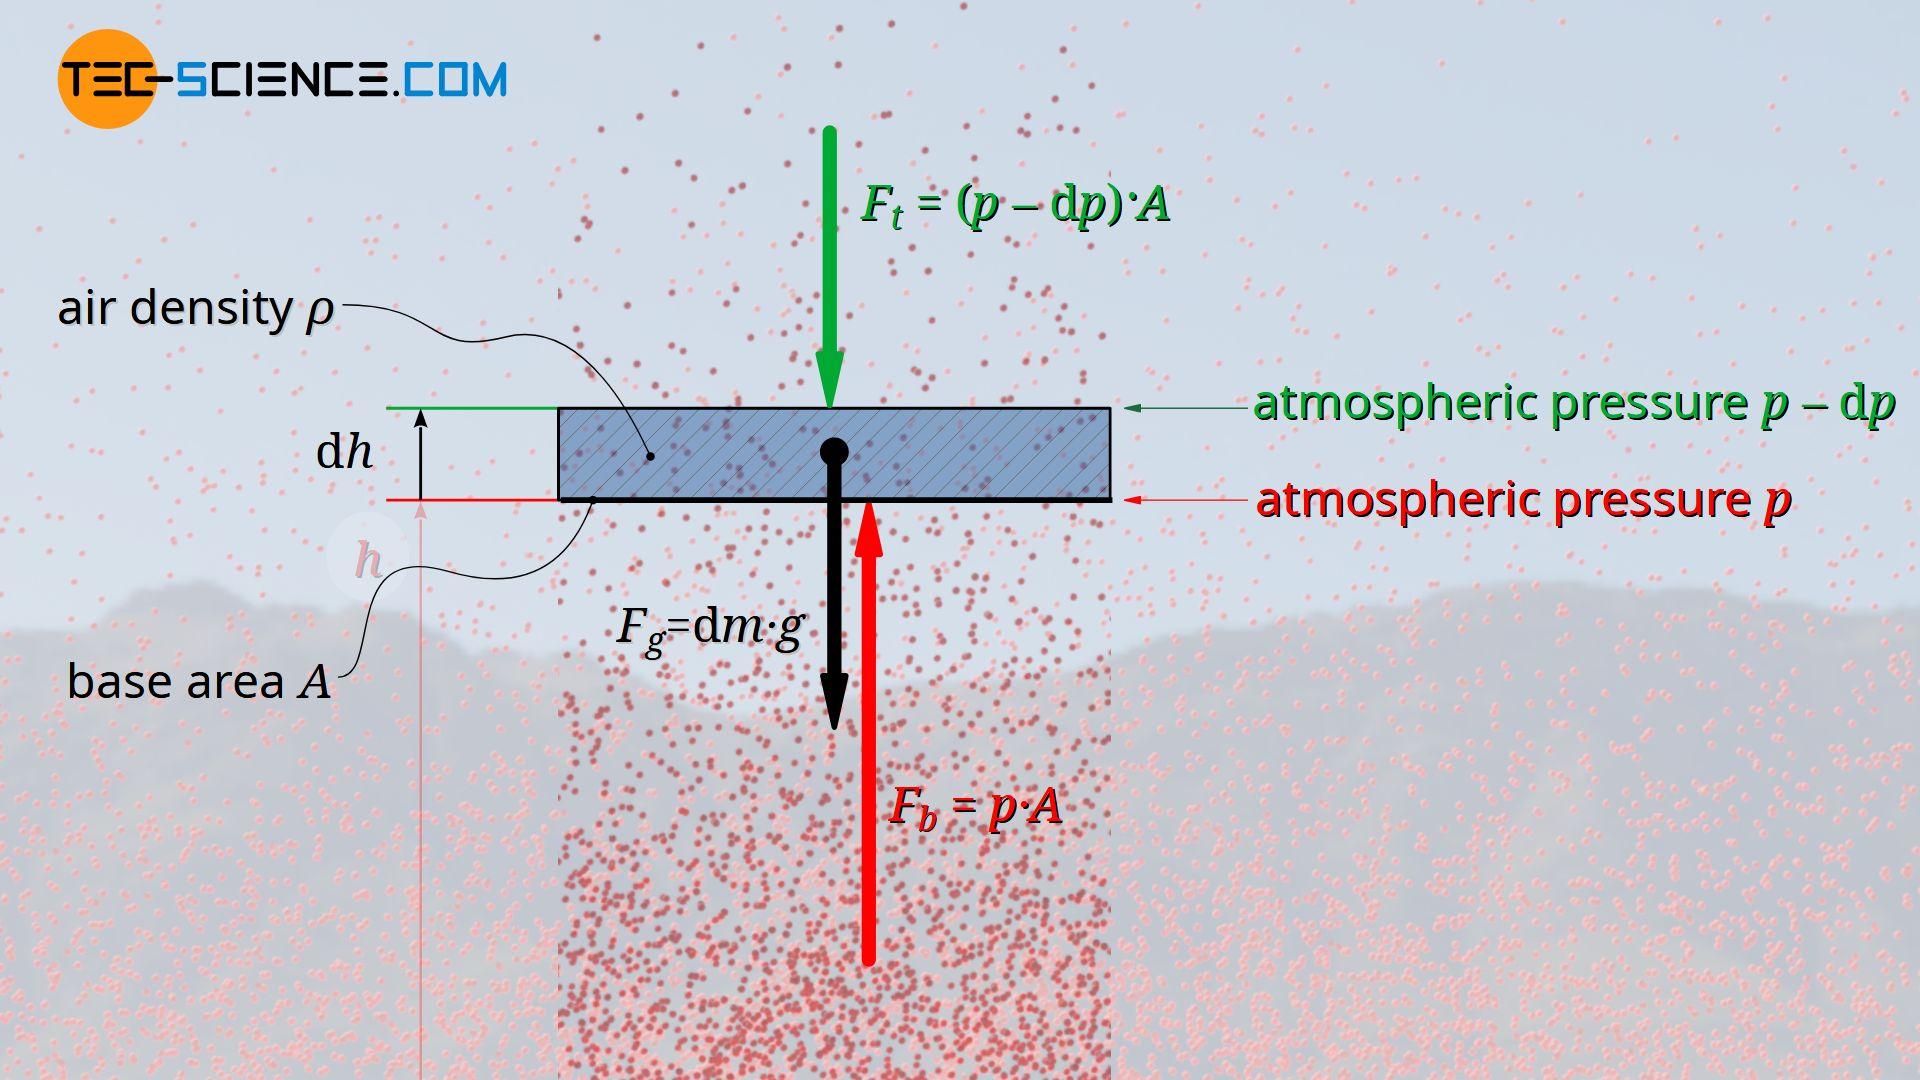 Derivation of the barometric formula